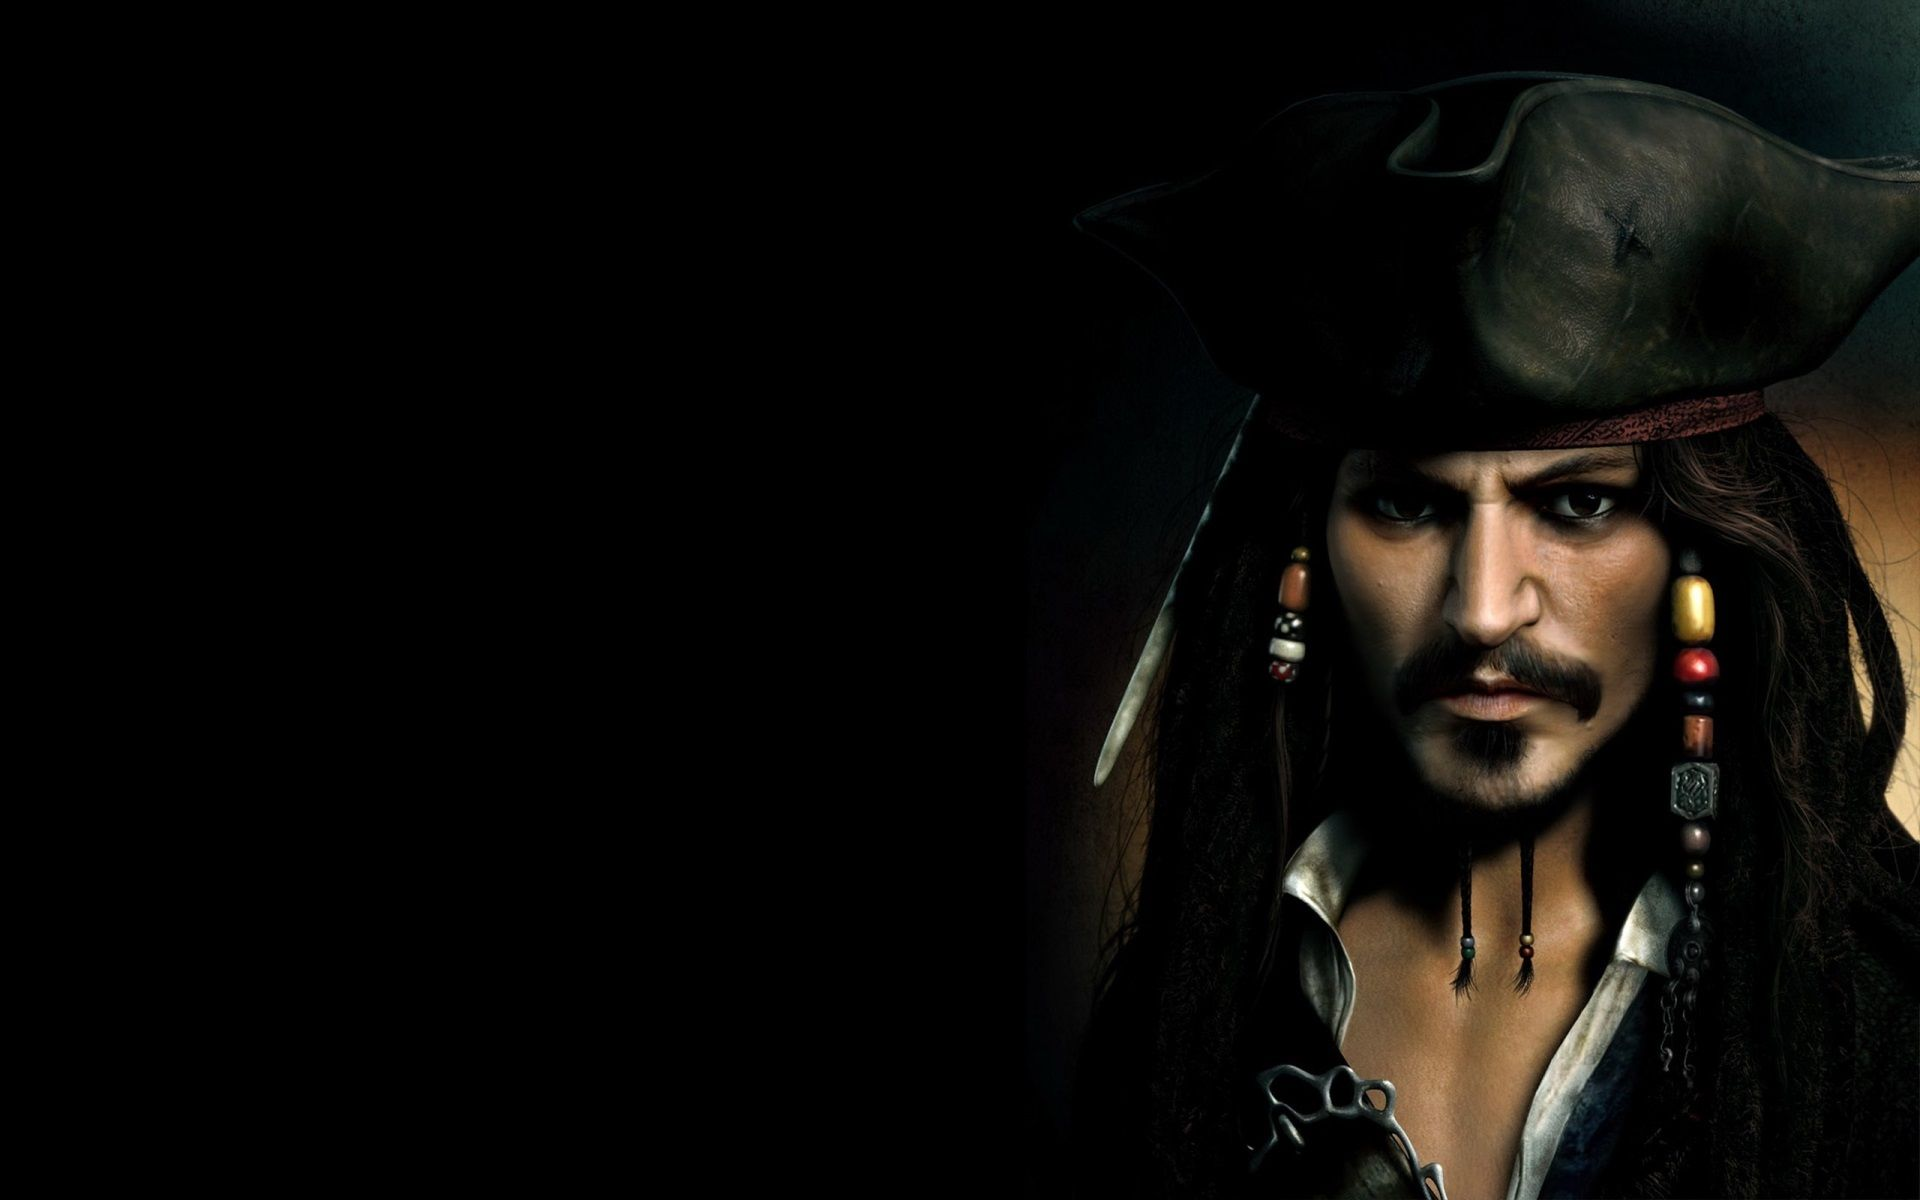 1920x1200 Johnny Depp Hq Desktop Wallpaper Free Download Jack Sparrow Wallpaper Captain Jack Sparrow Jack Sparrow